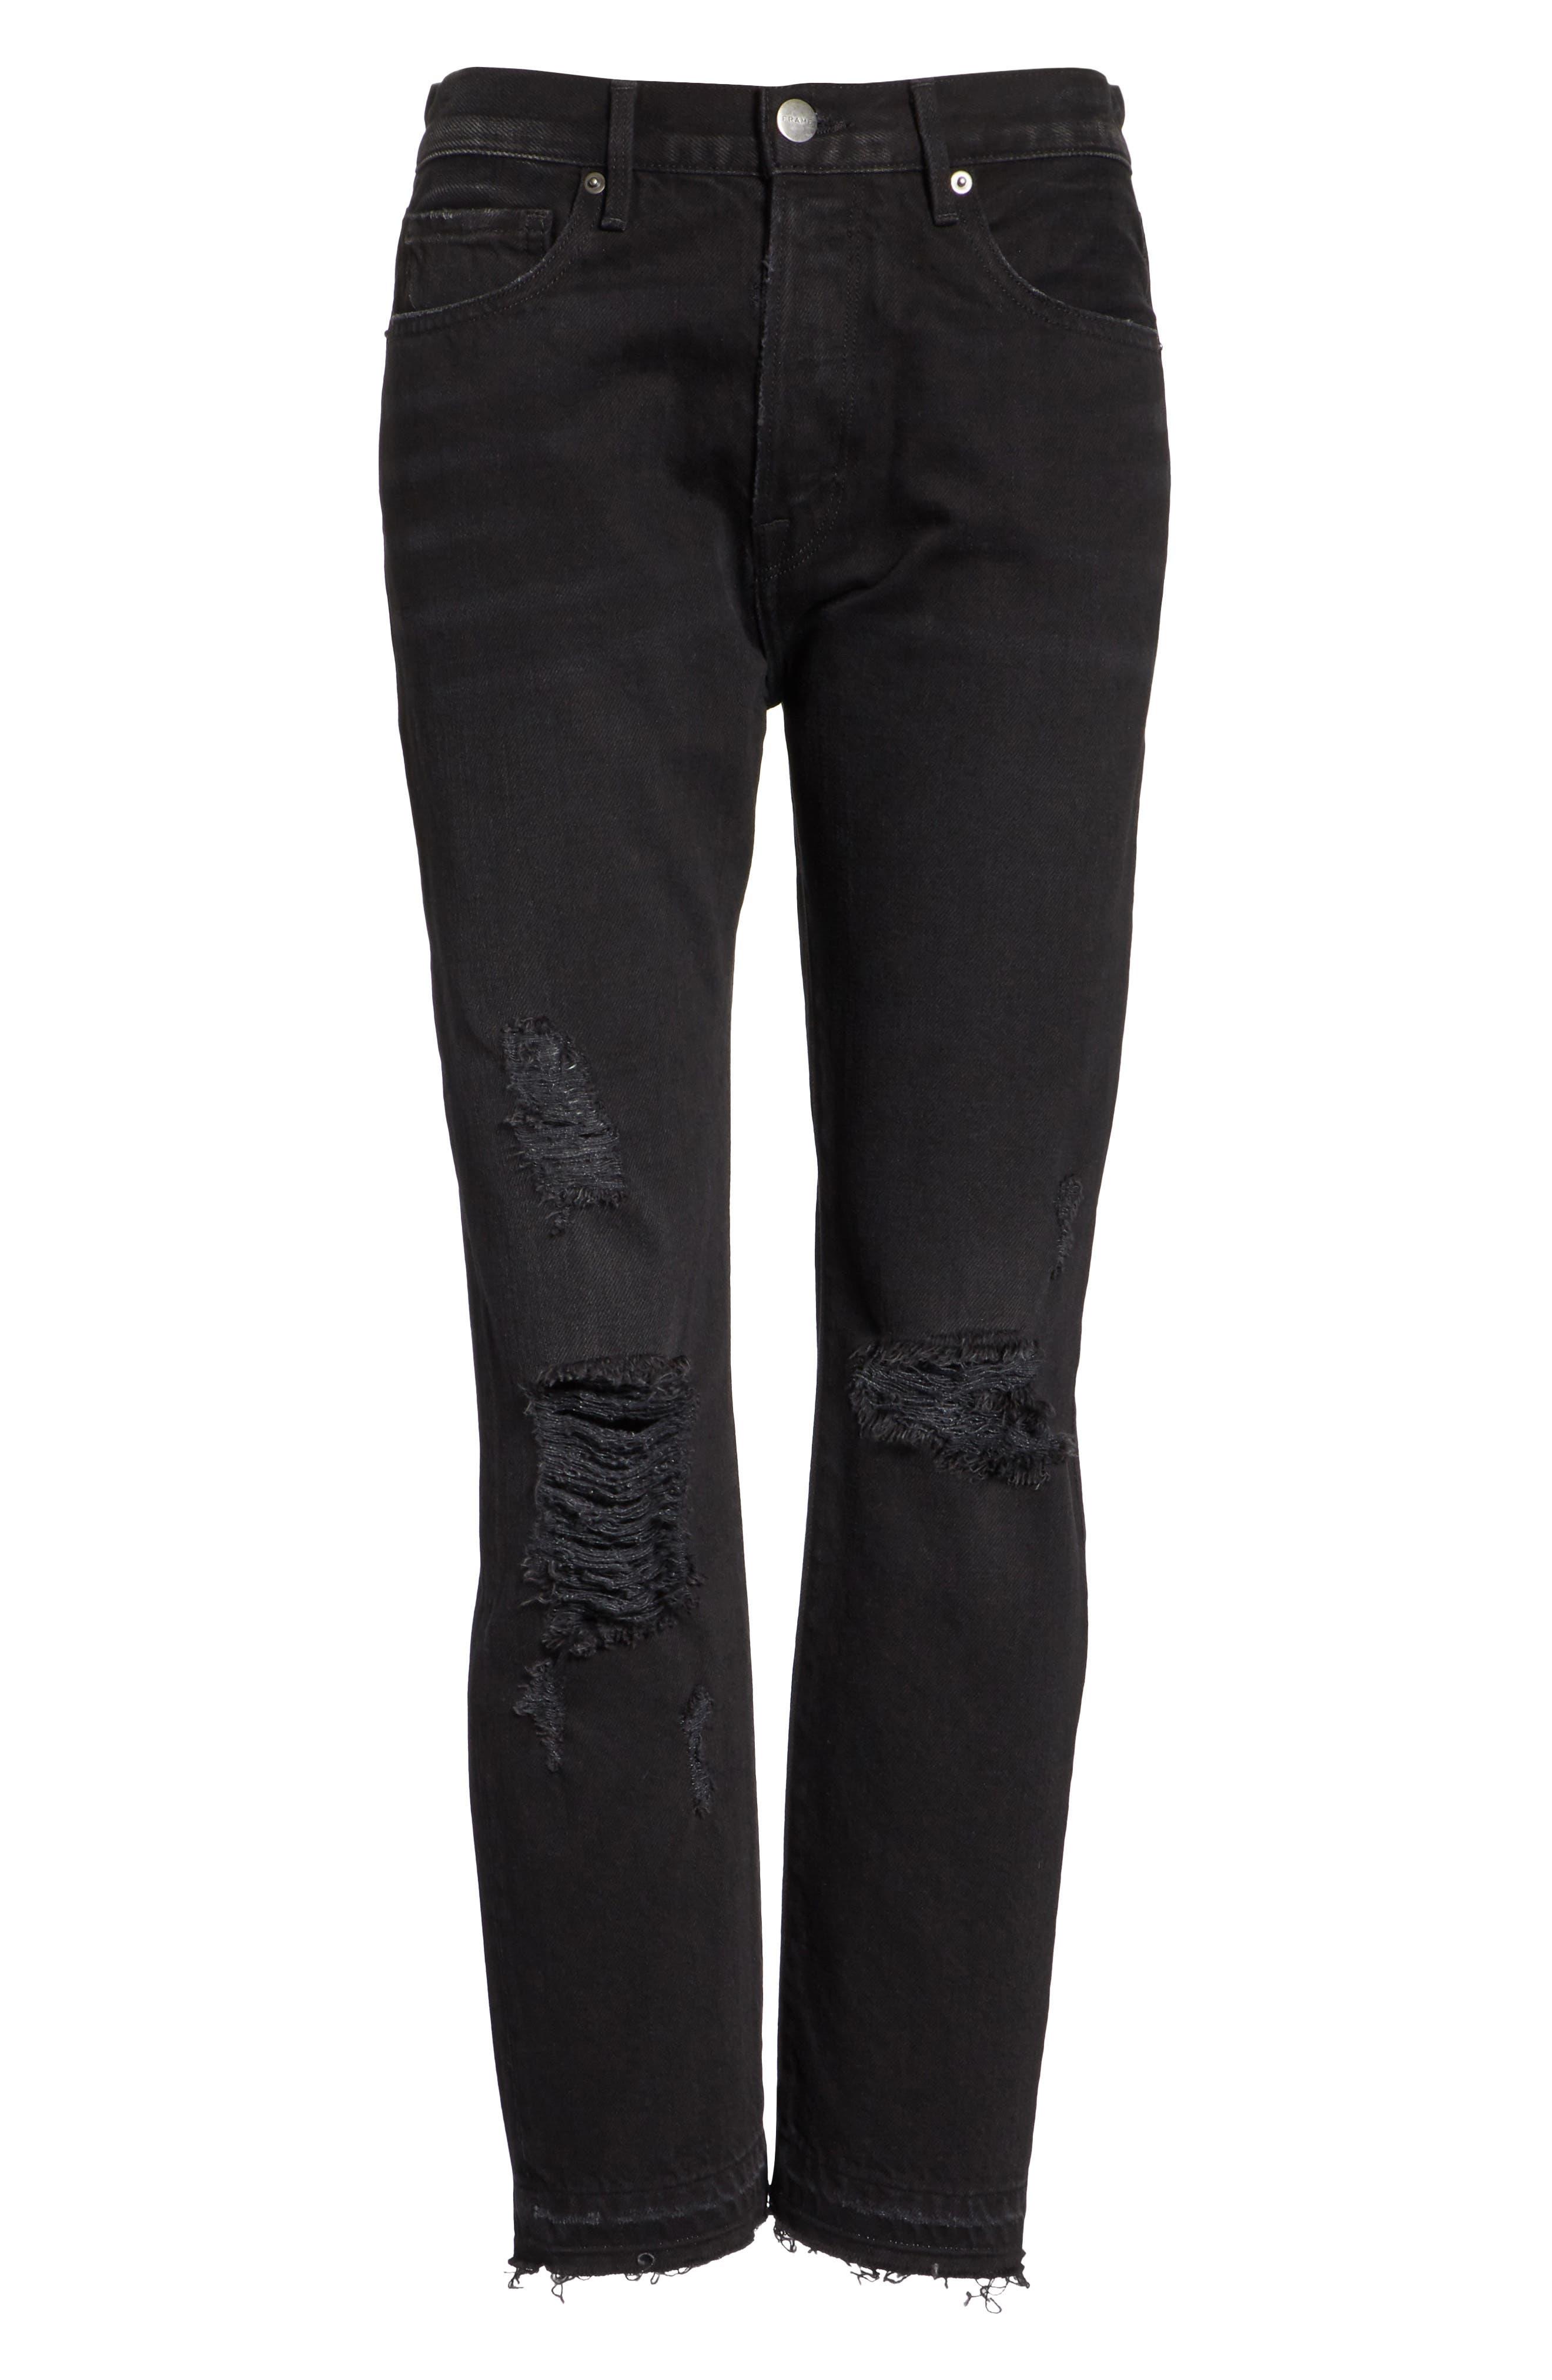 Le Original Released Hem High Waist Jeans,                             Alternate thumbnail 6, color,                             Grey River